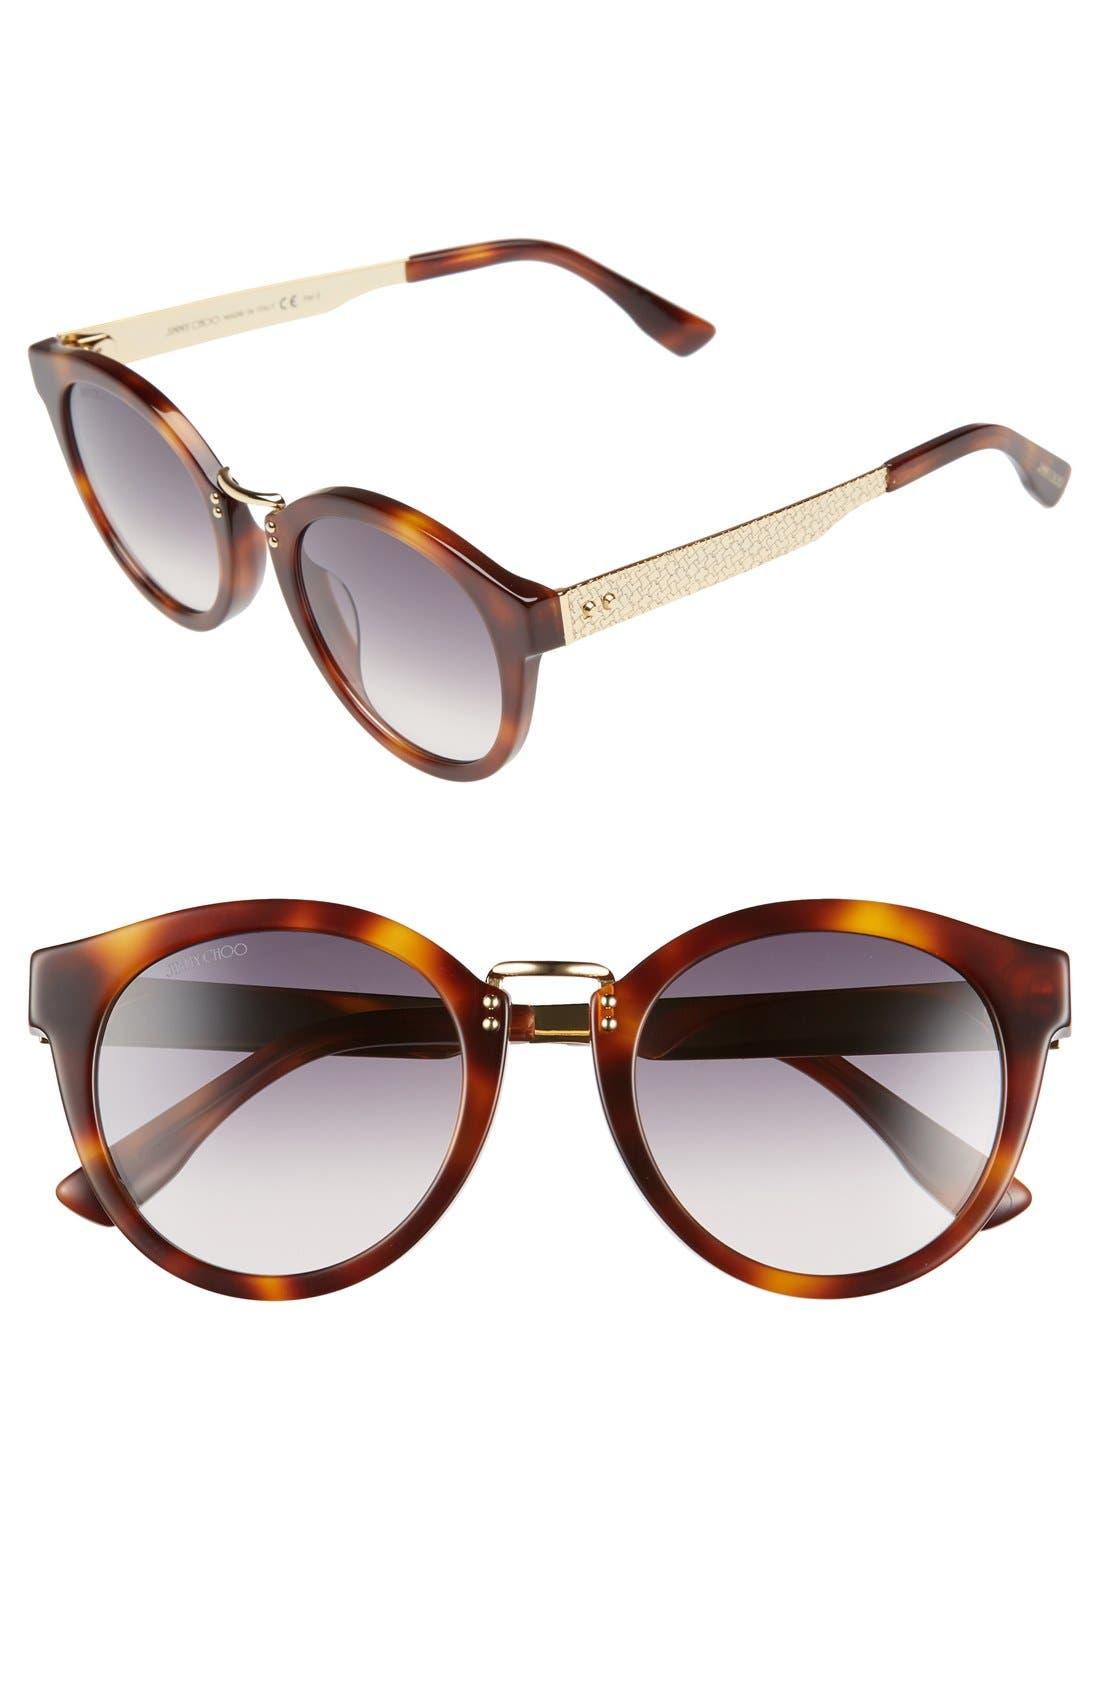 Main Image - Jimmy Choo 'Pepys' 50mm Retro Sunglasses